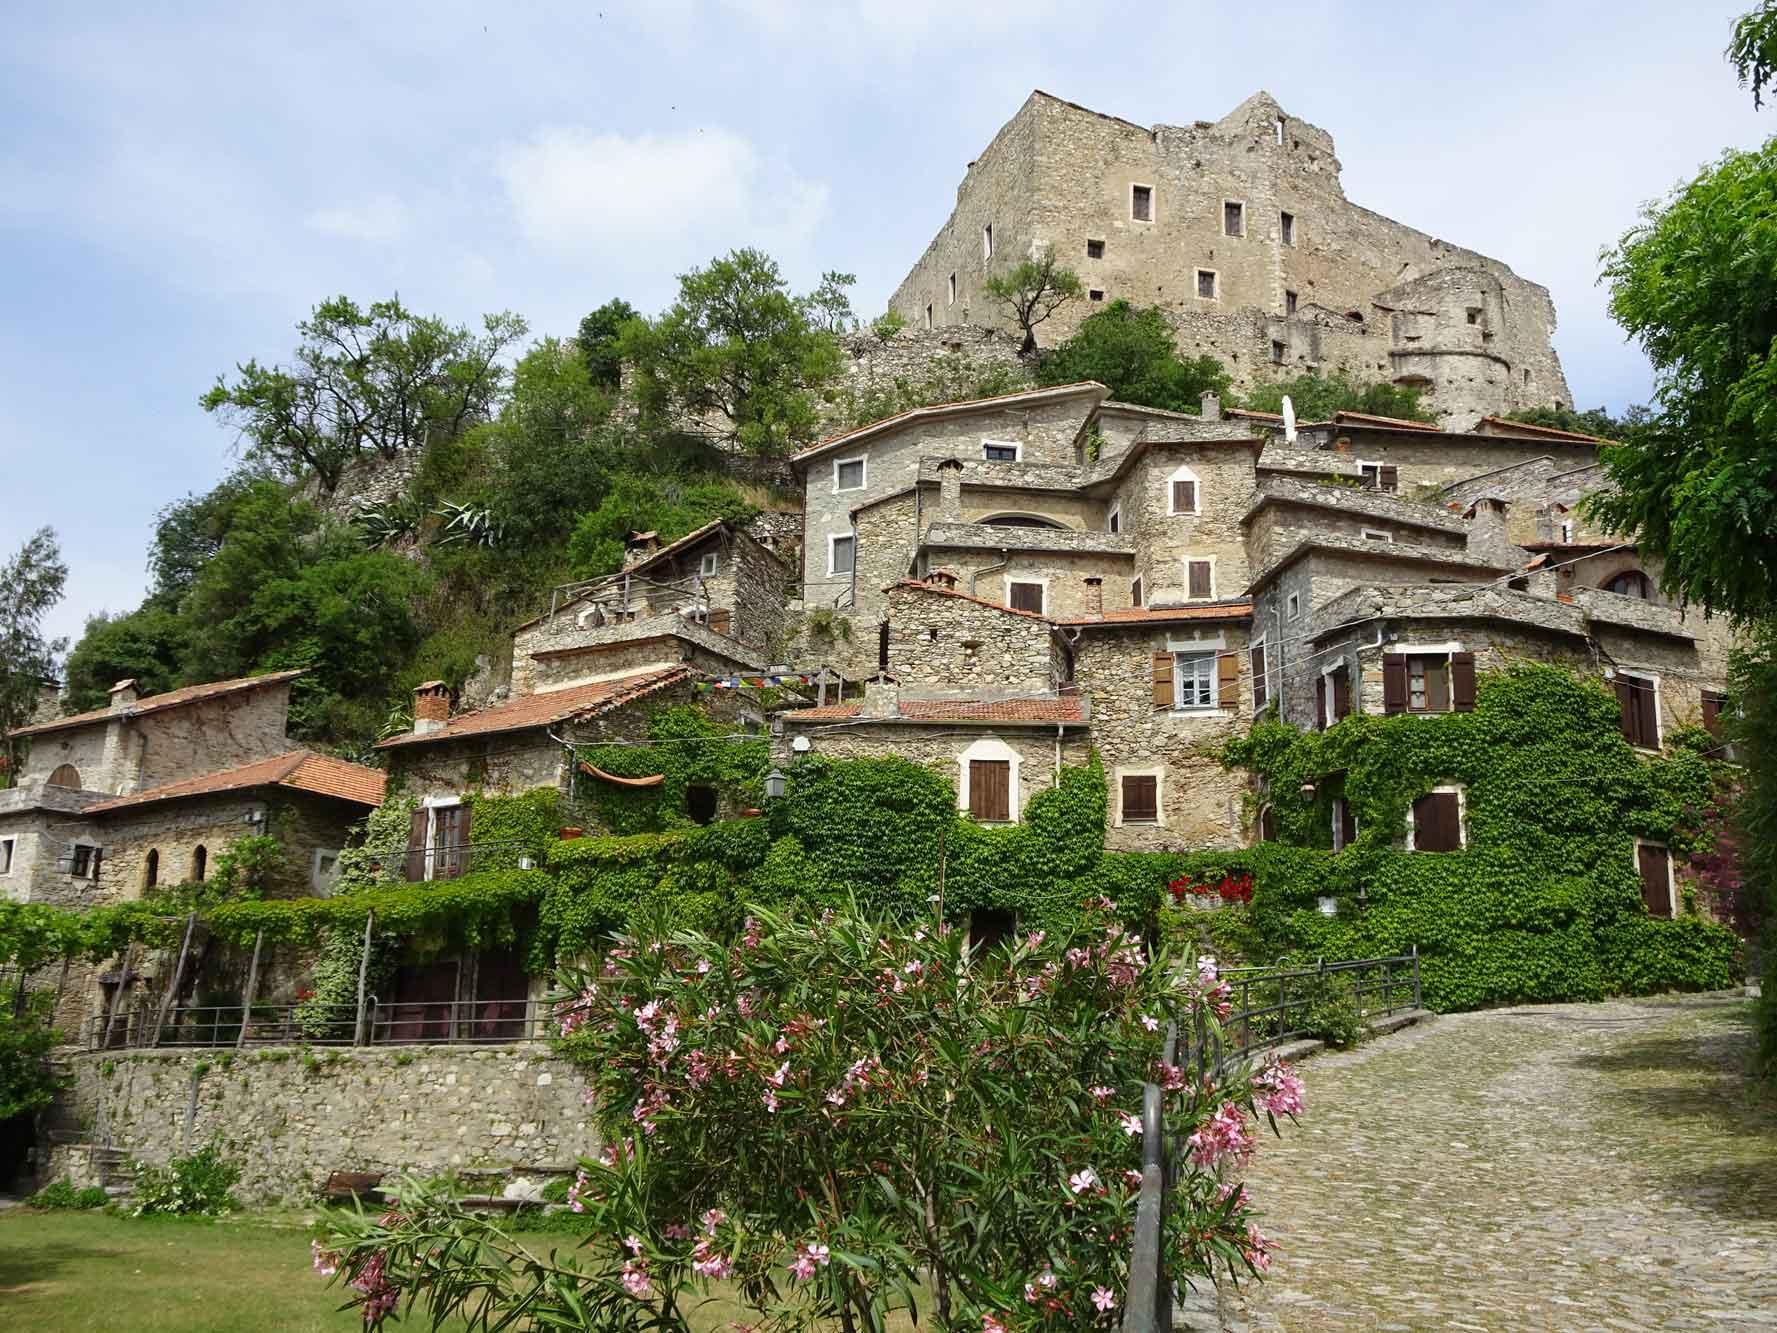 Piemont-Ligurien-Castelvecchio-di-Rocca-Barbena-1